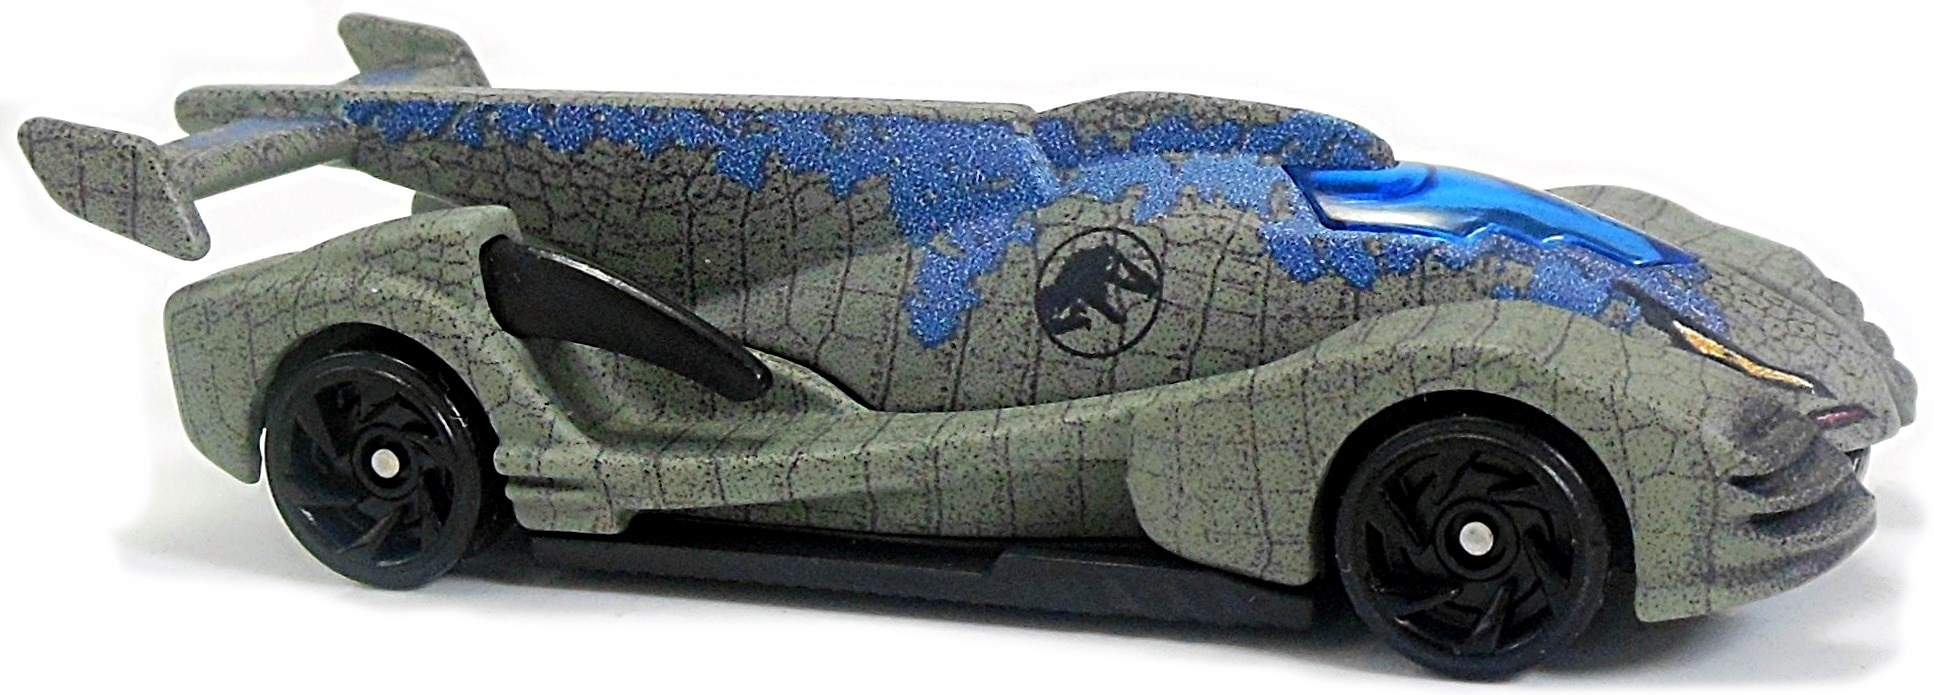 Stegosaurus Hot Wheels Jurassic World Diecast Character Car